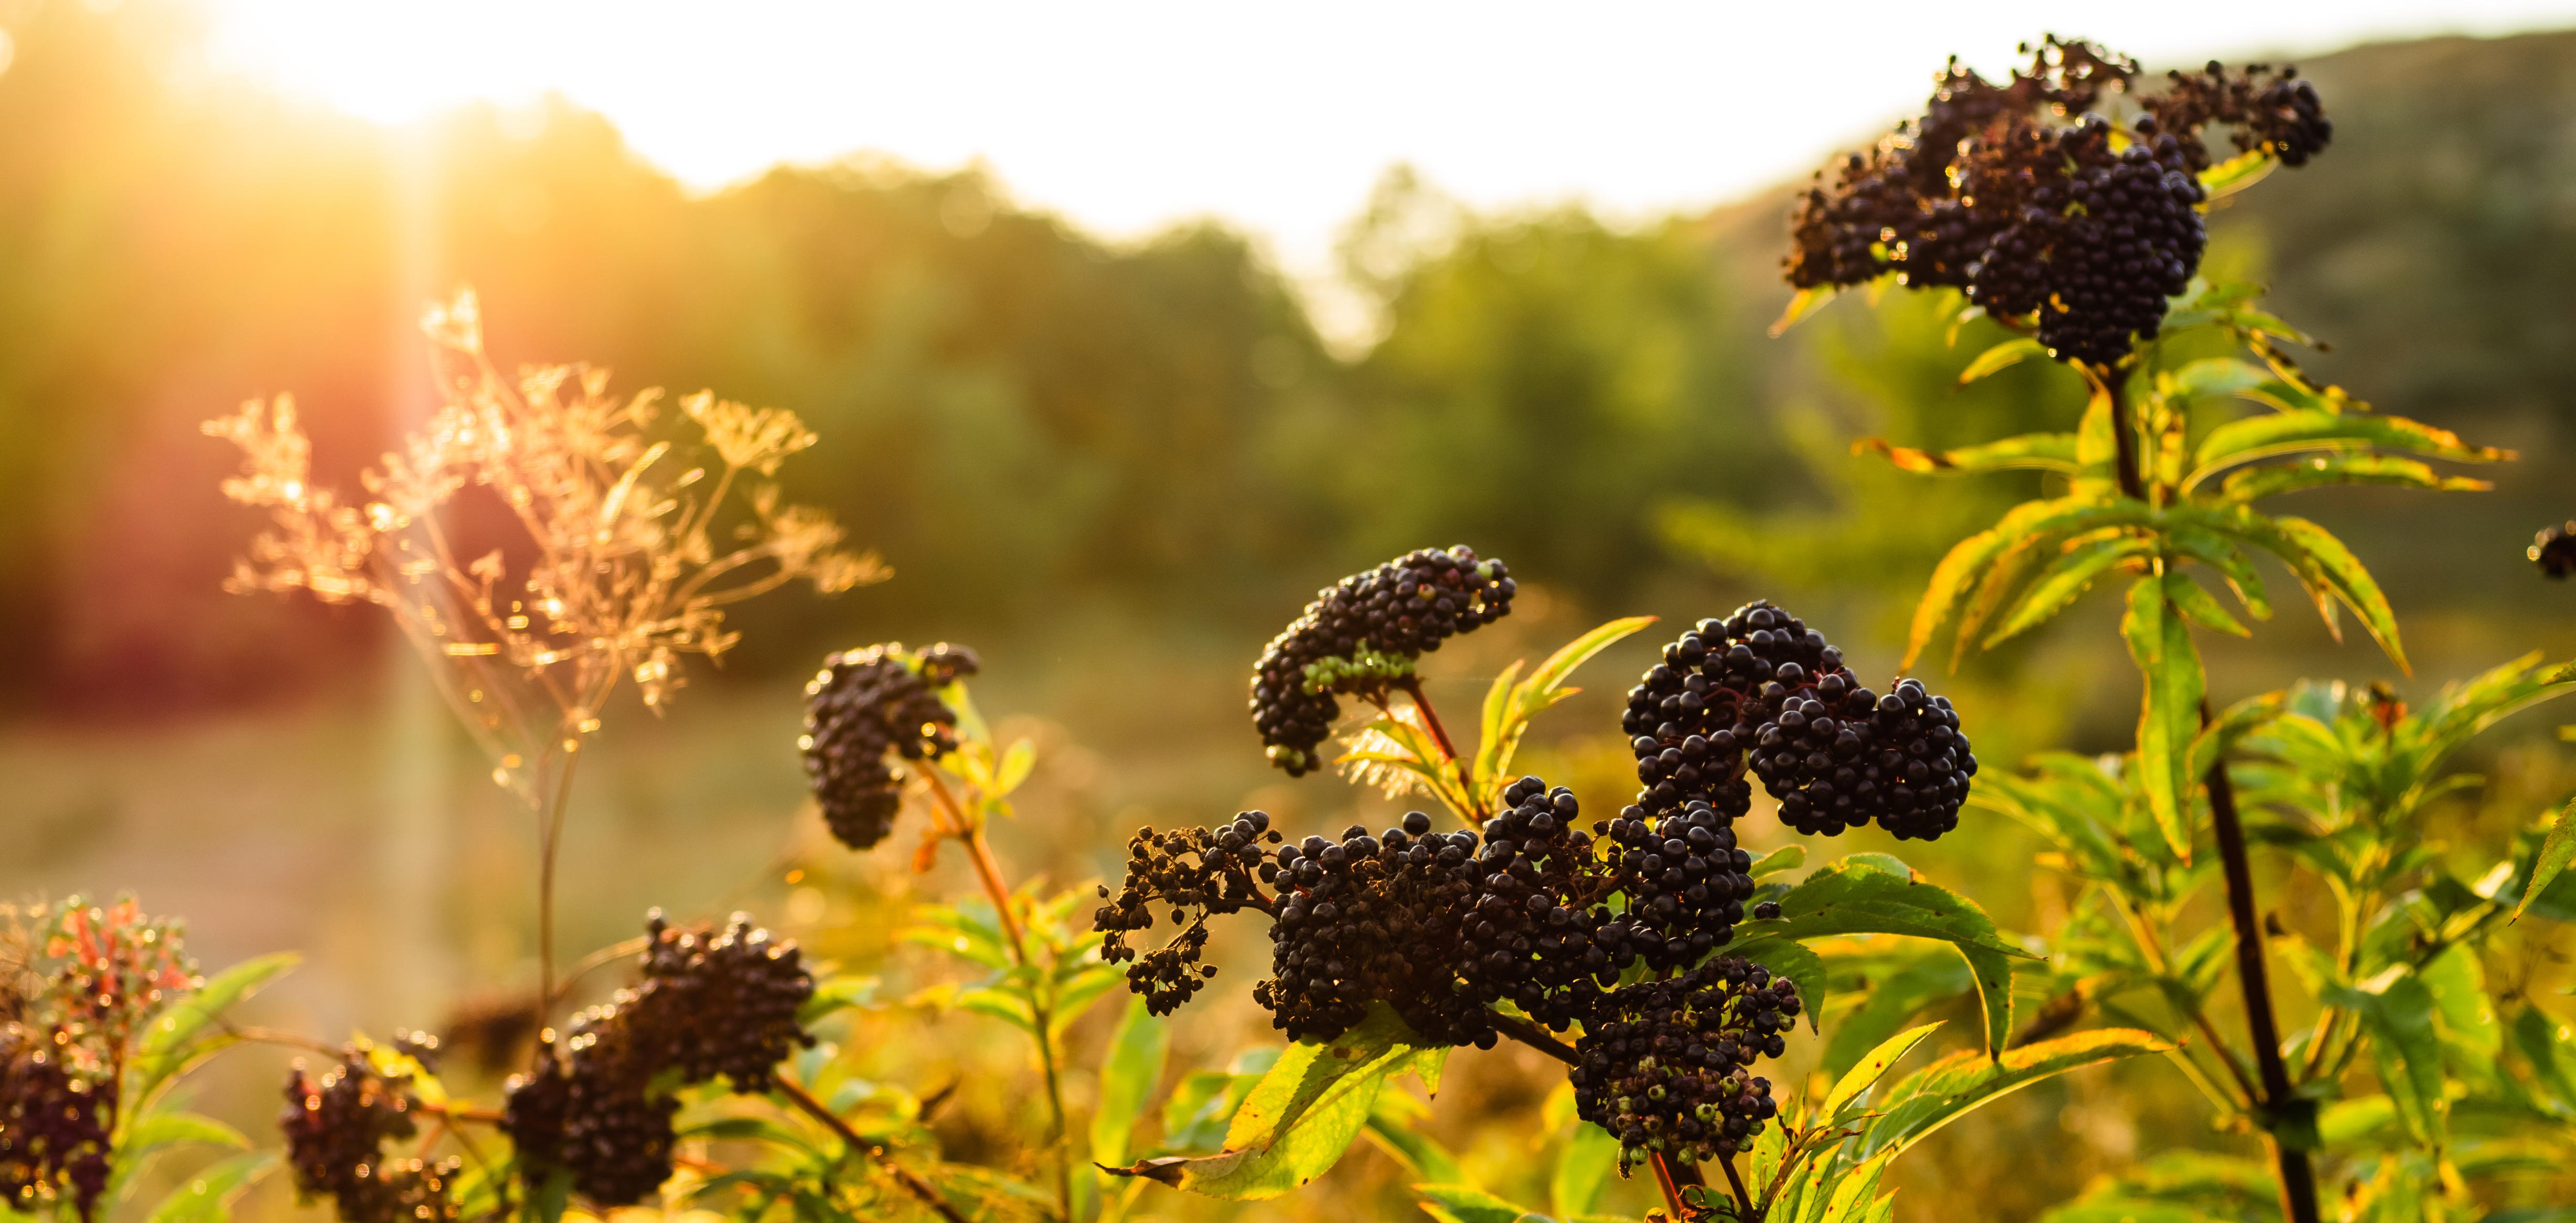 Clusters fruit black elderberry in garde